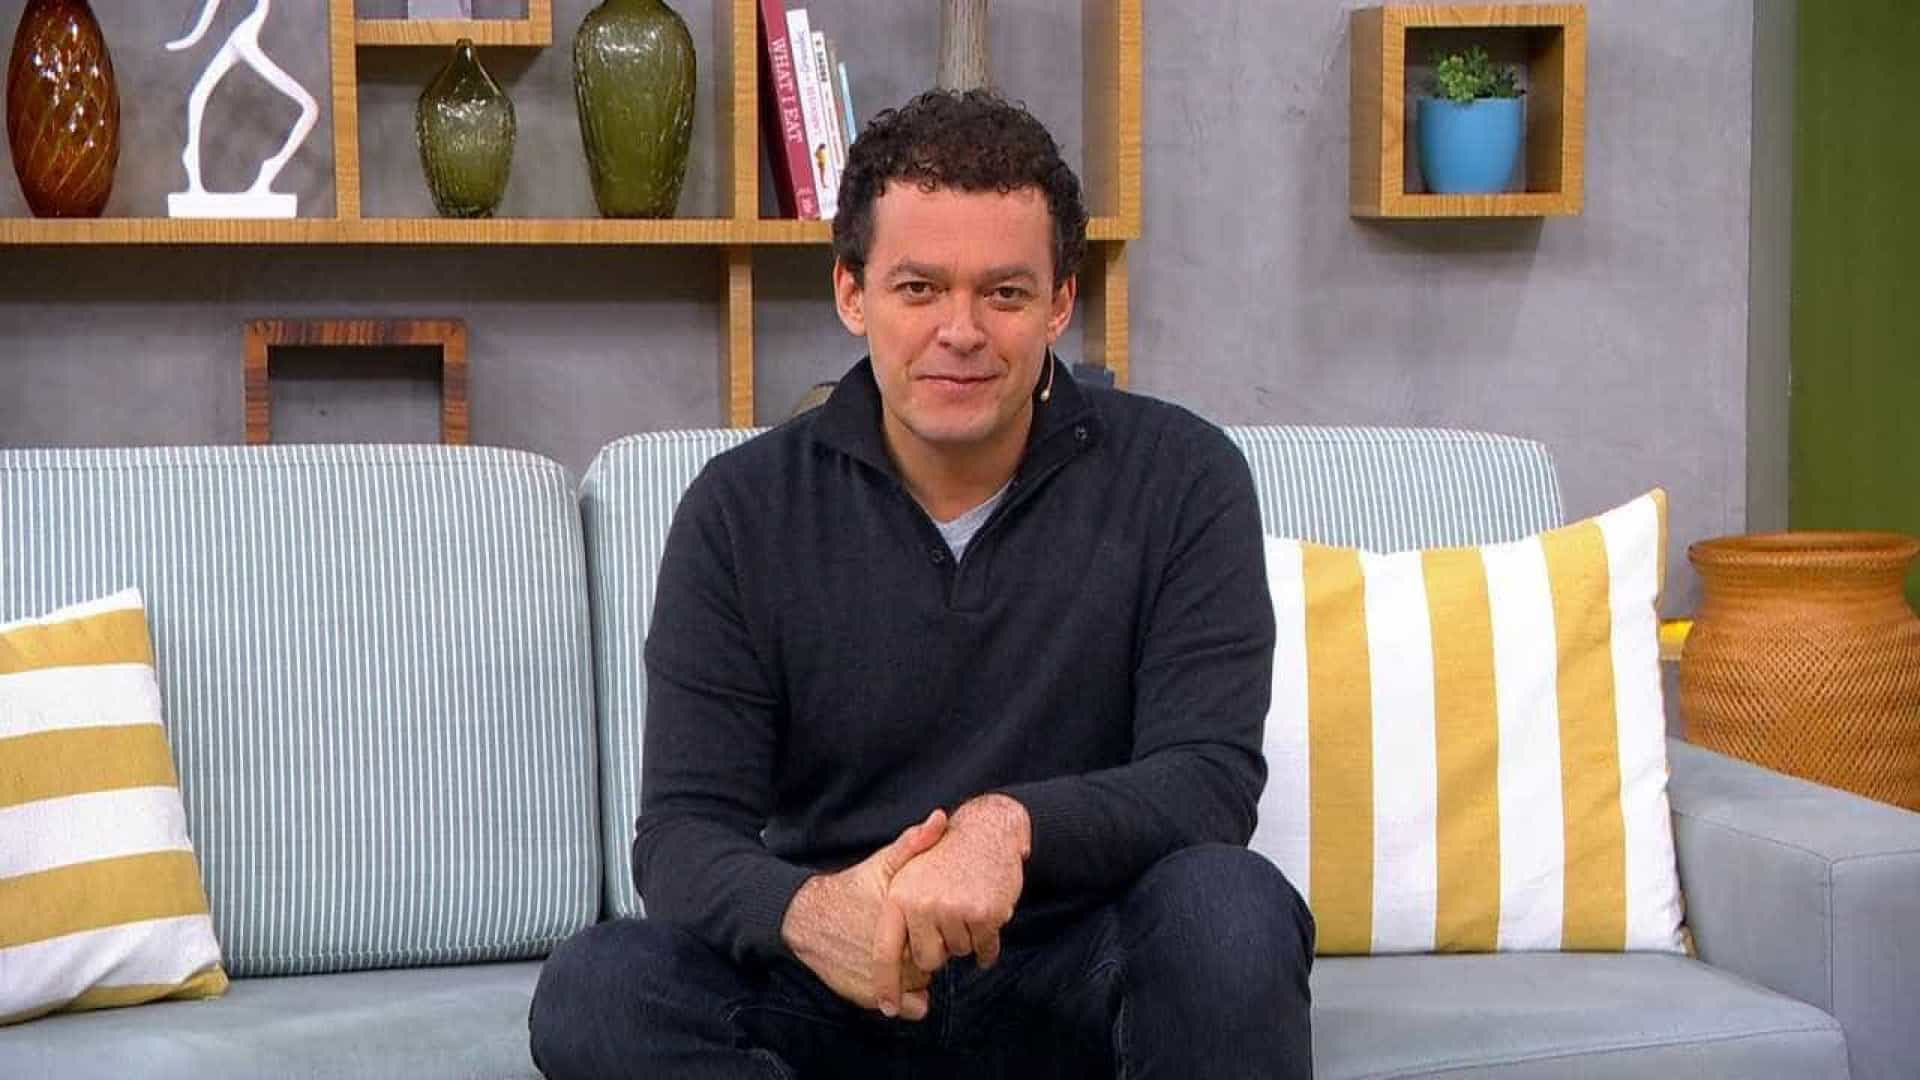 Demitido da 'Globo', Fernando Rocha tenta acordo com a 'Record'